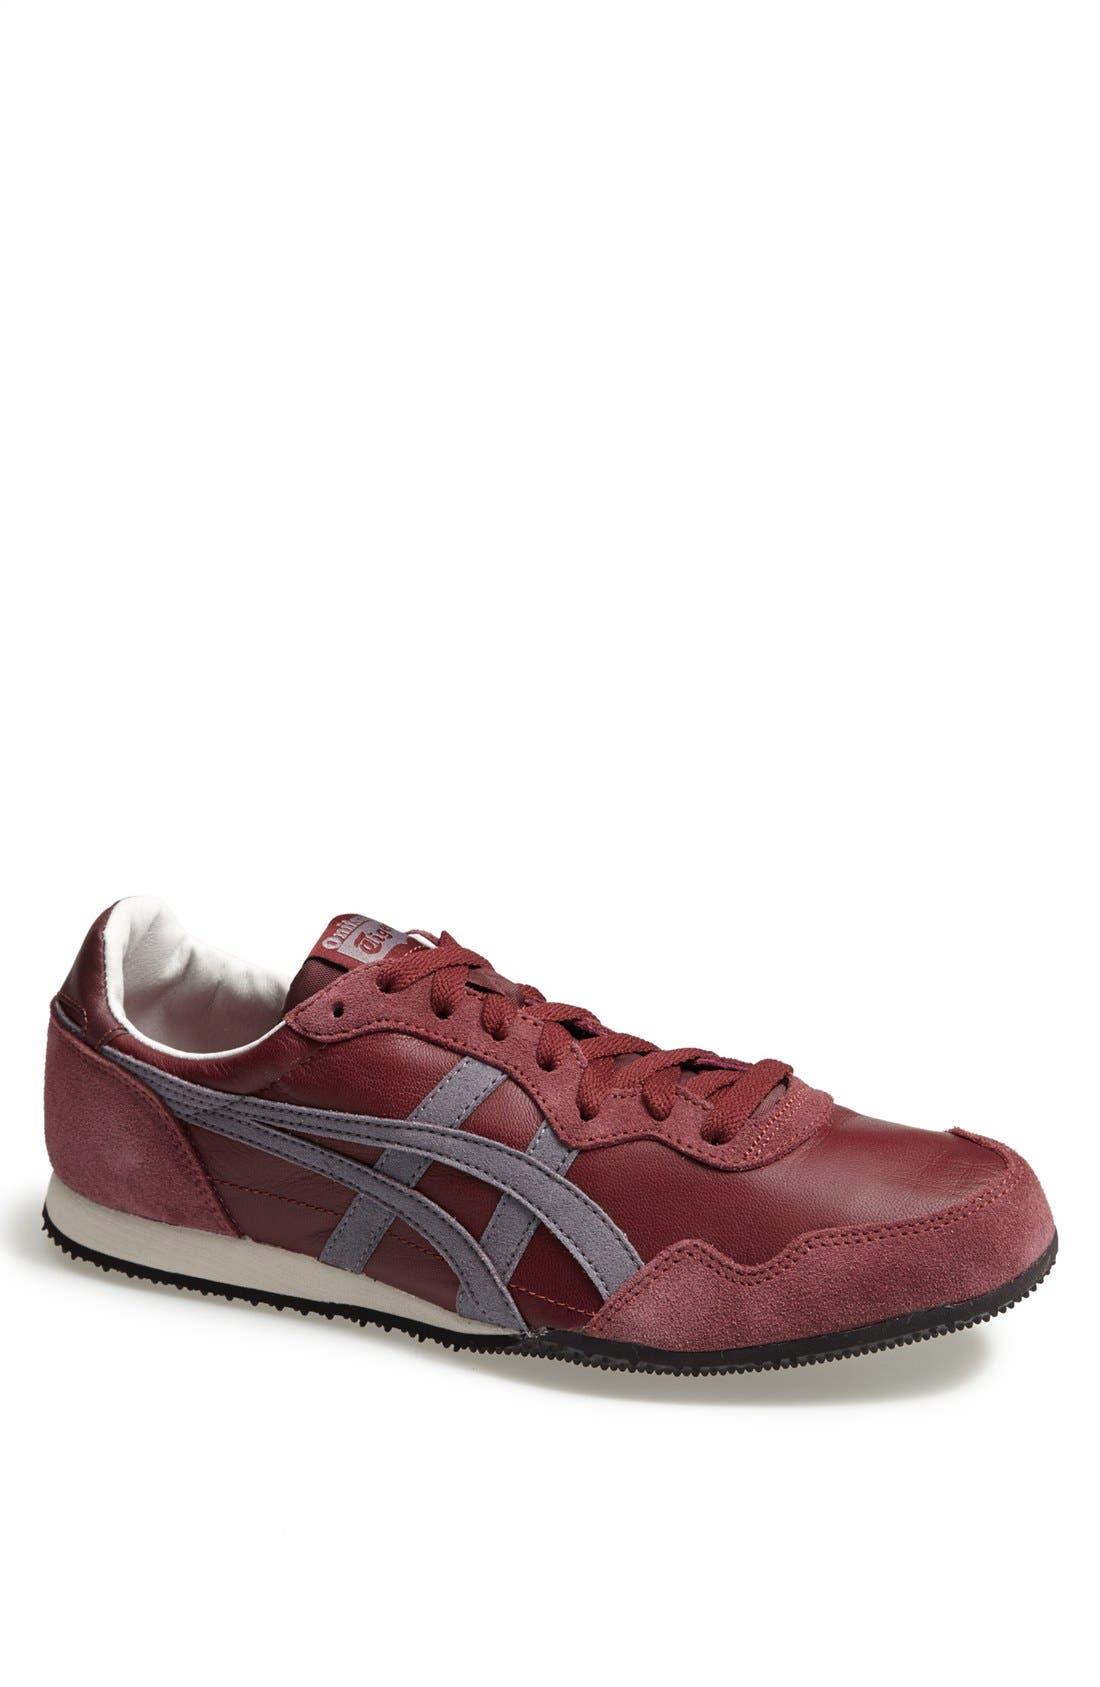 'Serrano' Sneaker,                             Main thumbnail 1, color,                             Burgundy/ Grey